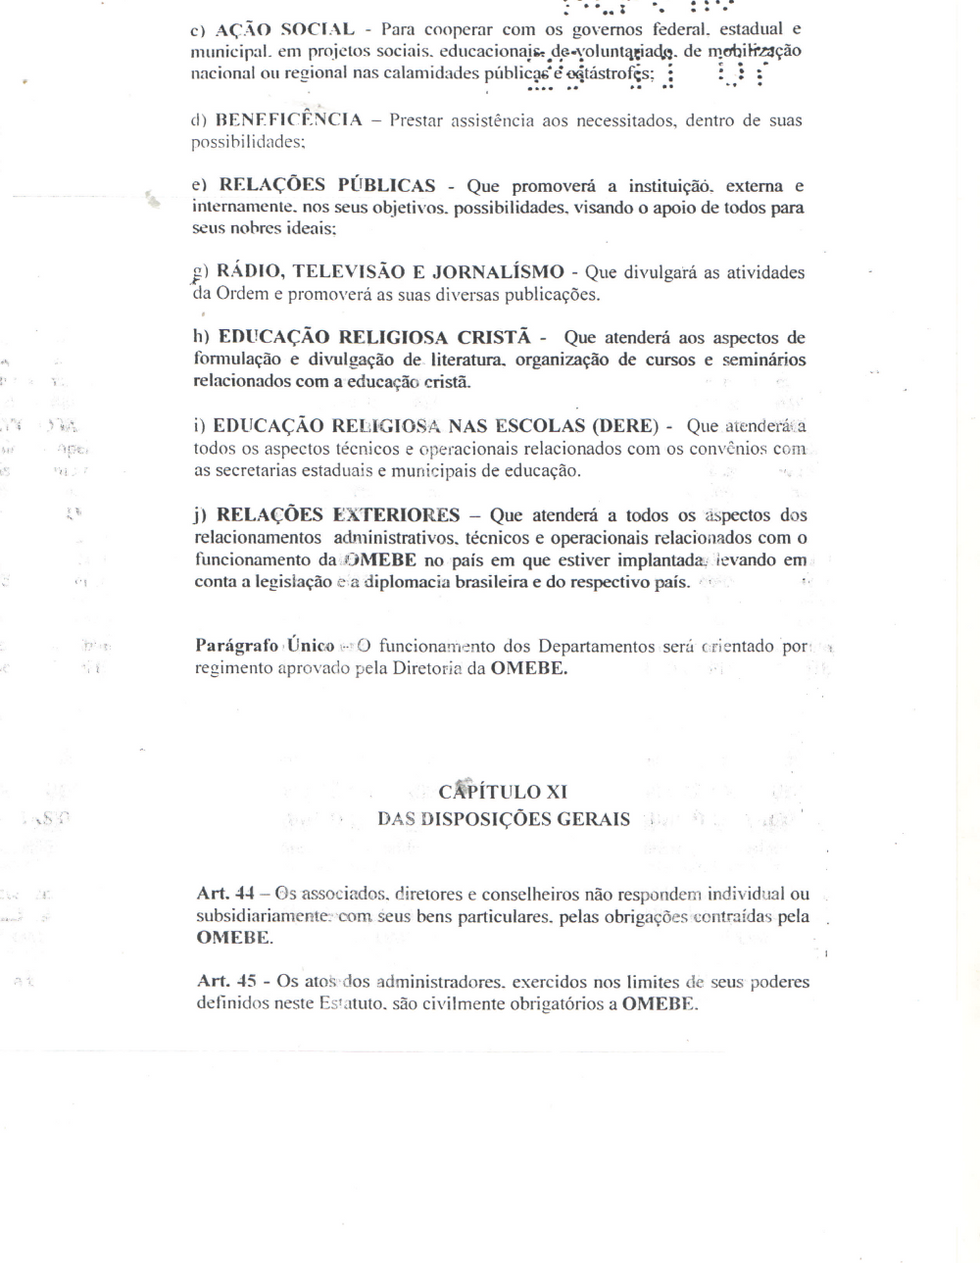 Estatuto-pag-12.png